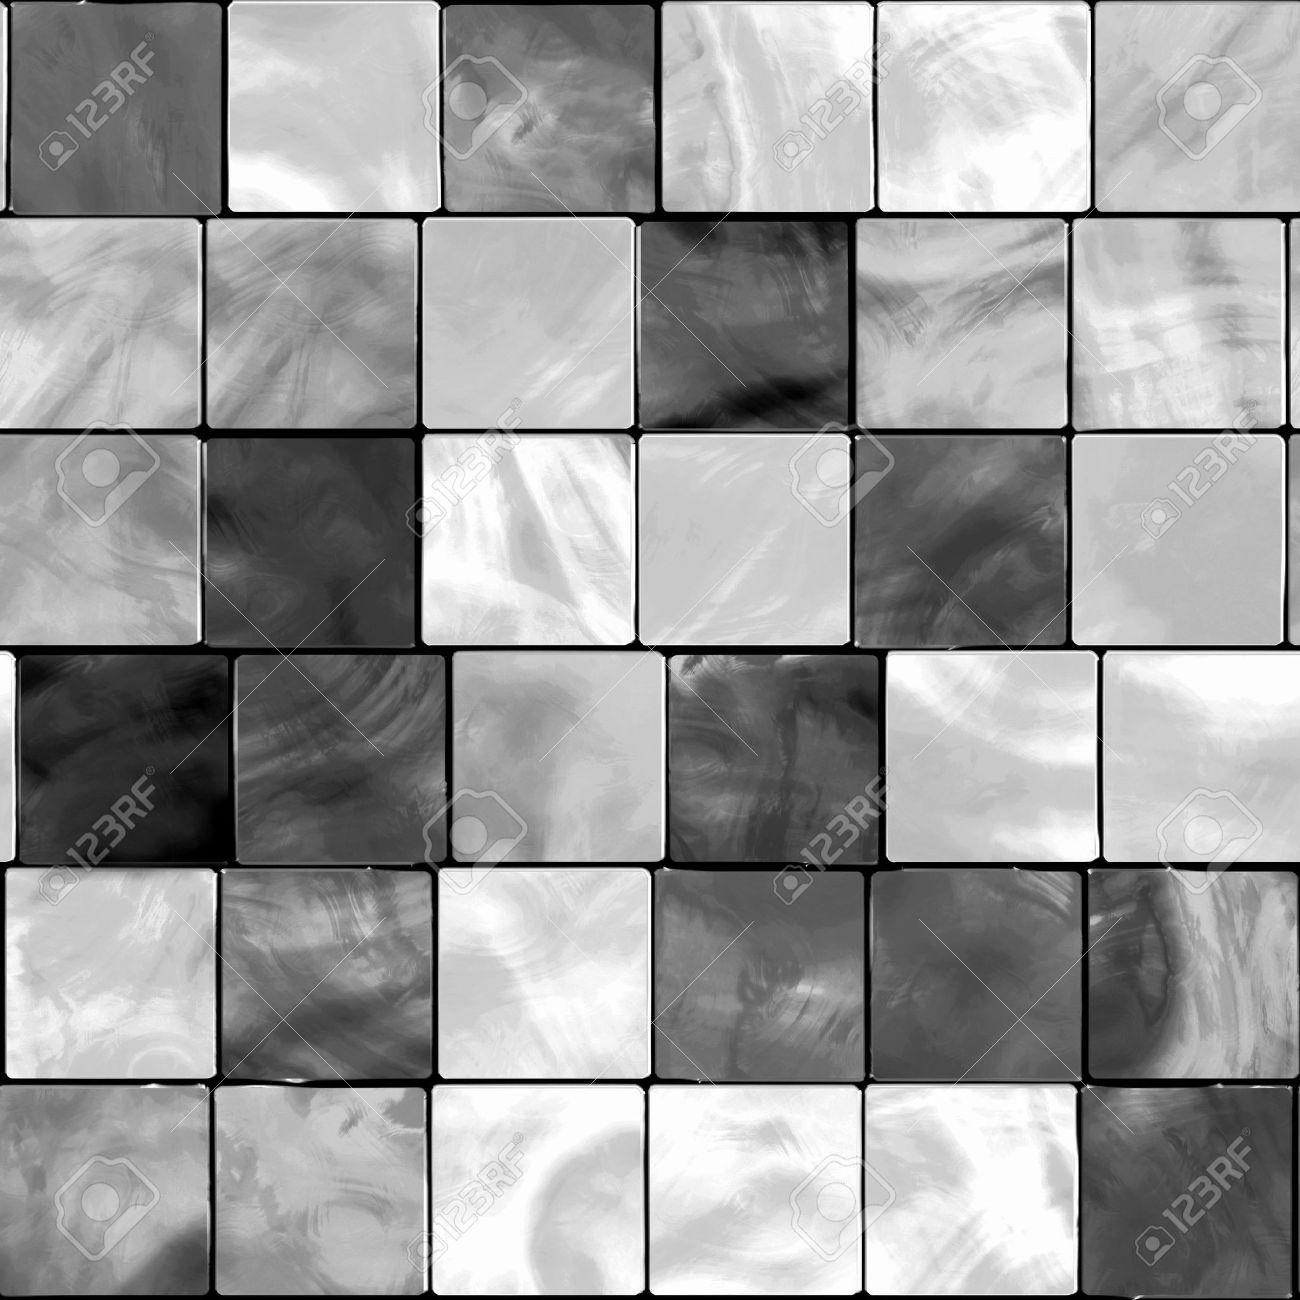 White Floor Texture. Black And White Tile Floor Texture